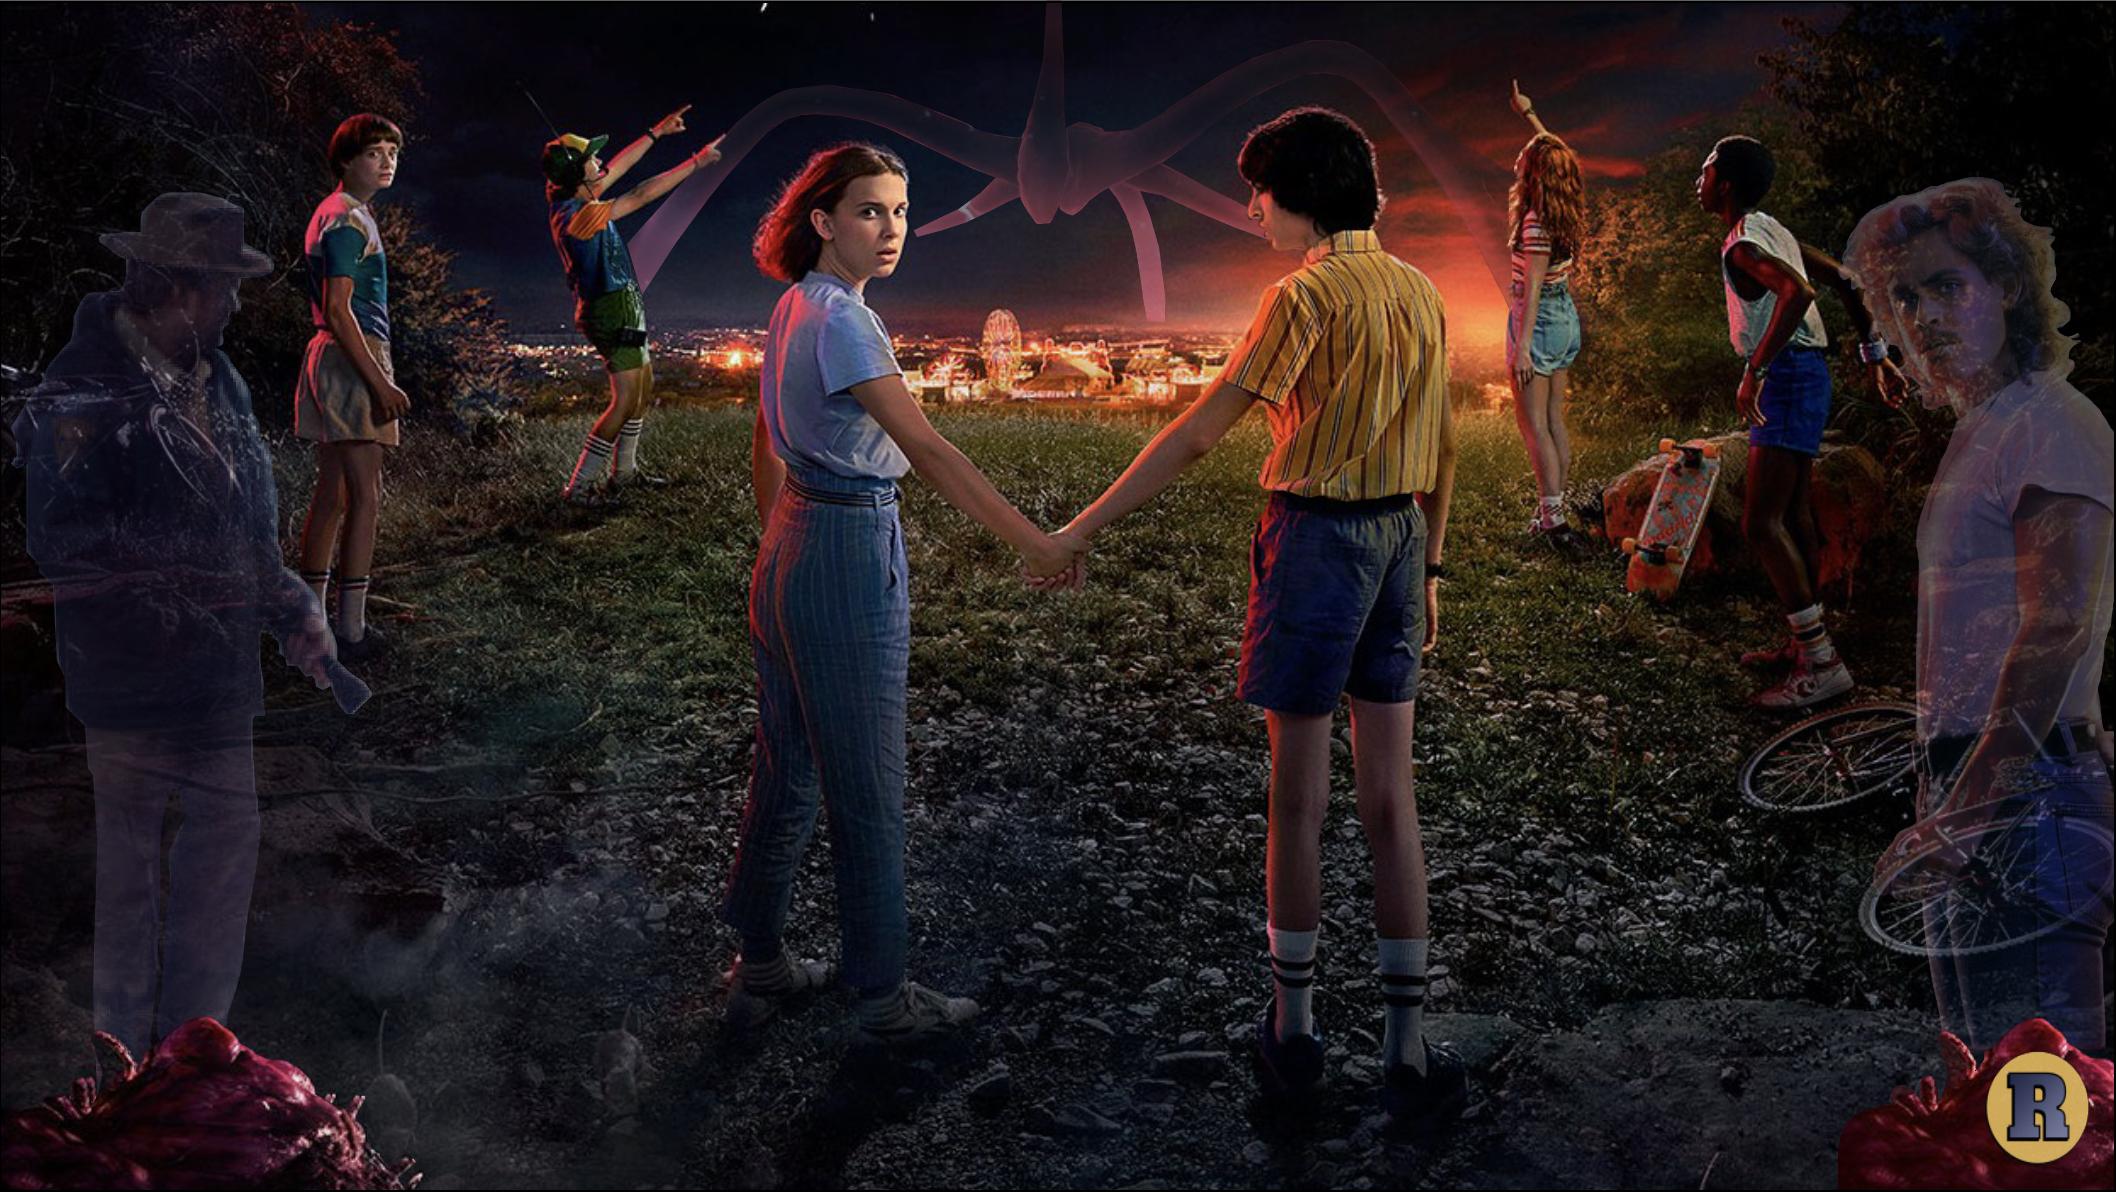 Netflix | Illustration by Javier Faustino